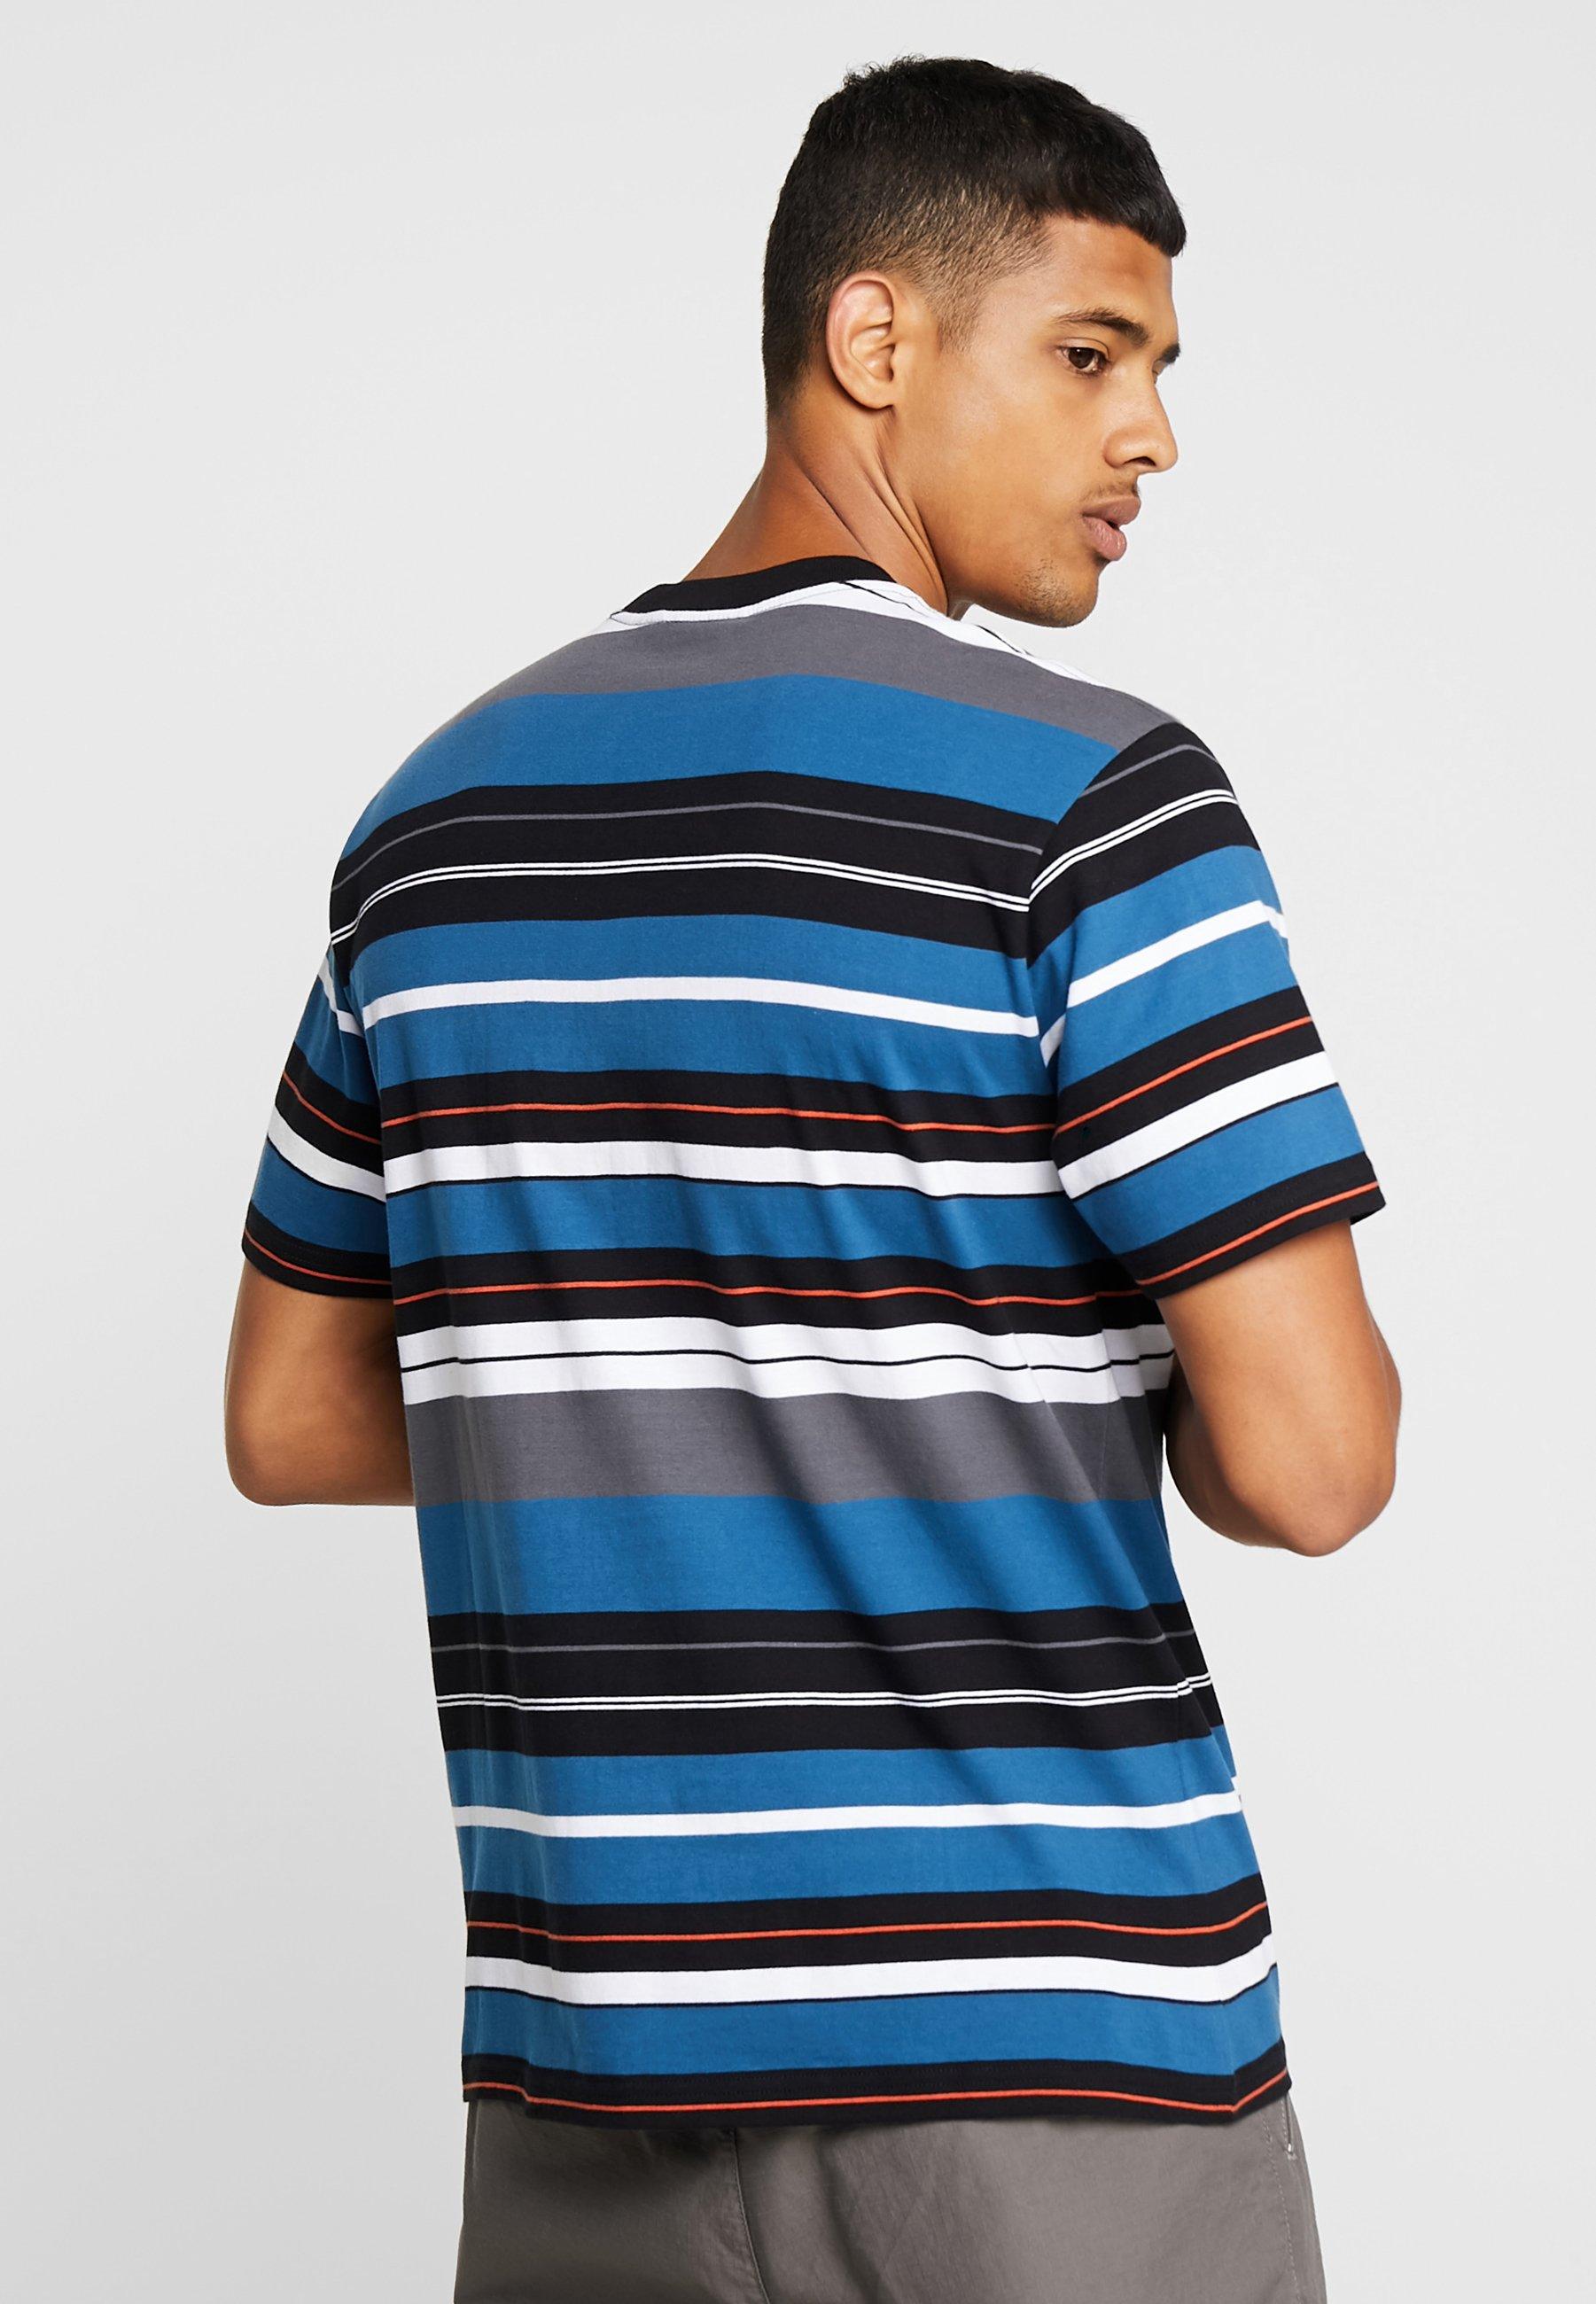 FlintT Carhartt shirt Prussian Blue Imprimé Wip 3uK5TlJF1c